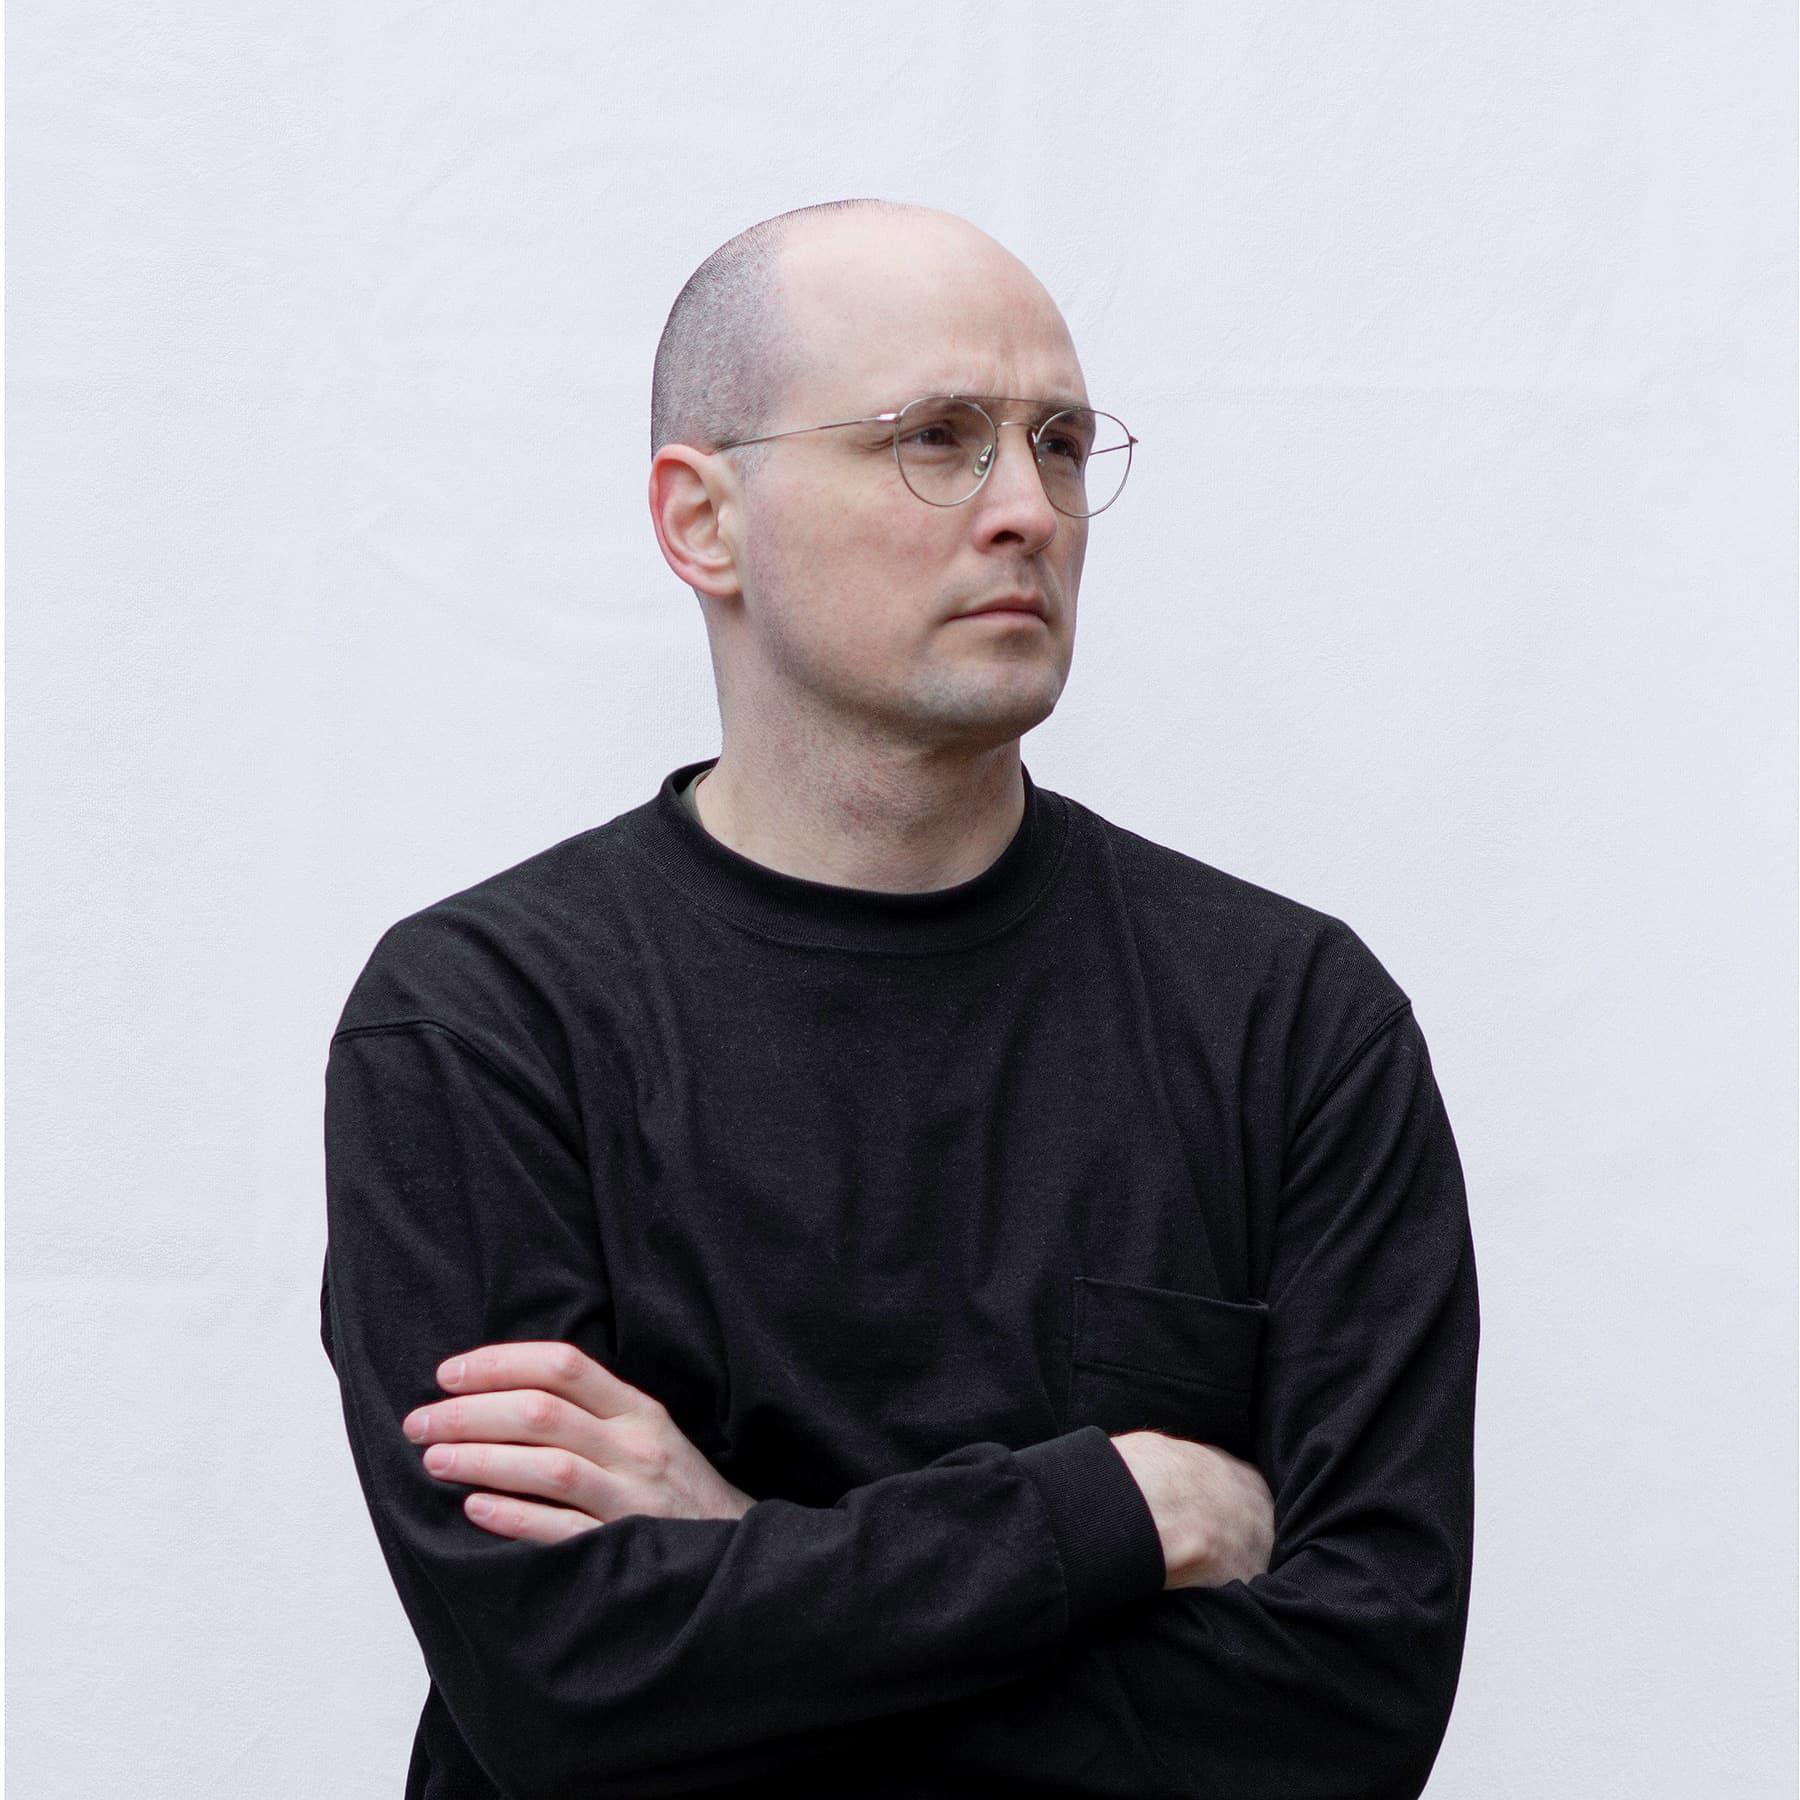 A portrait of Daniel Robert Prieto